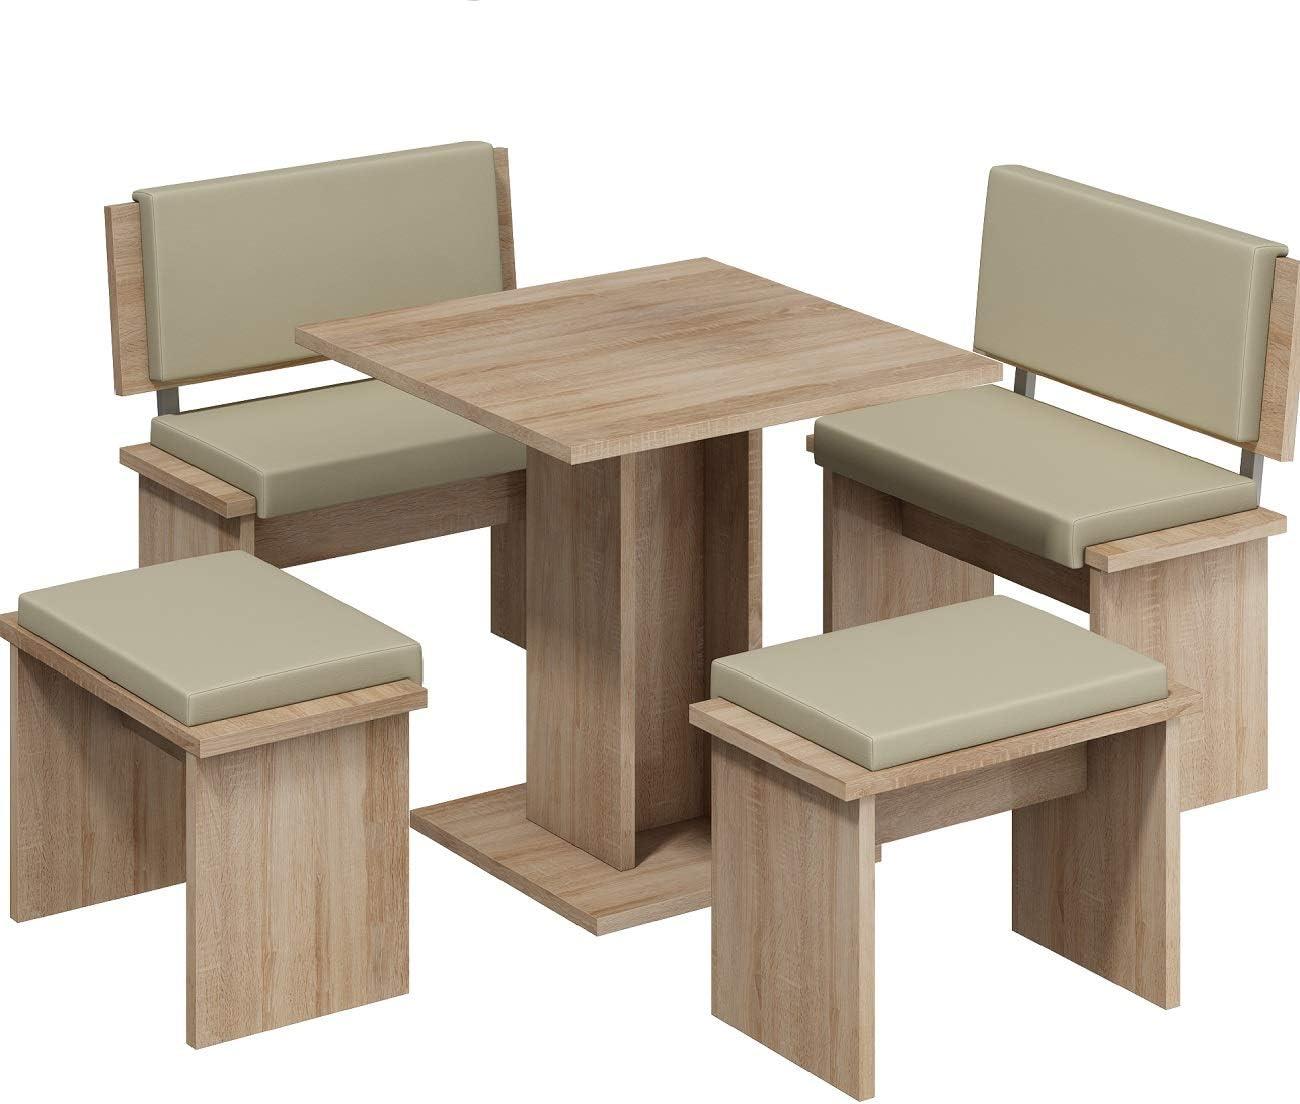 Furniture.Agency Multiple Finishes Eco-leather cushions Sonoma OAK/Biege